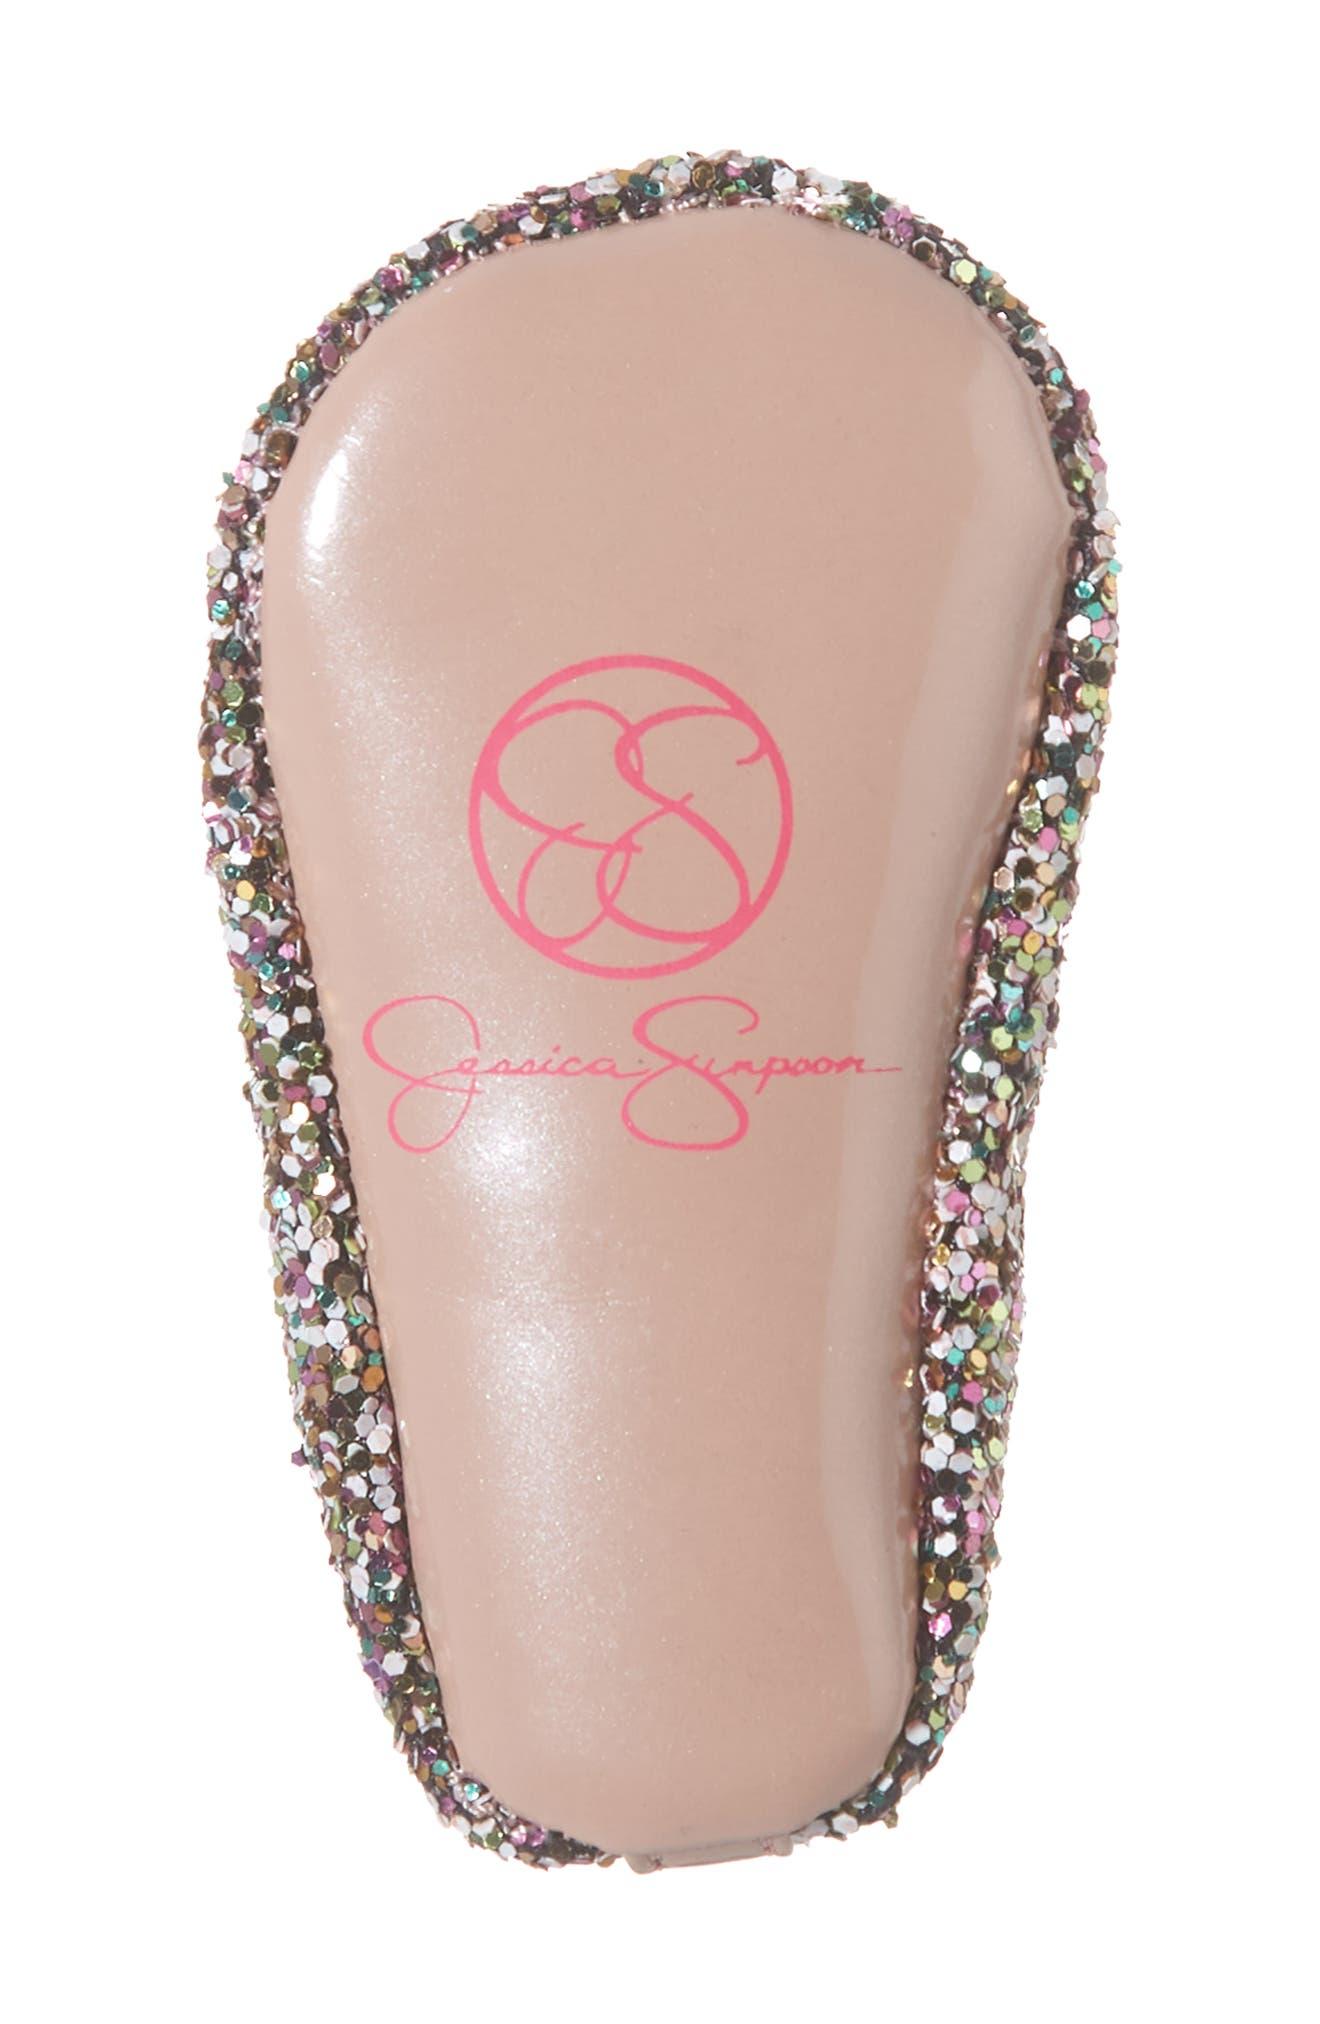 JESSICA SIMPSON, Glitter Mary Jane Crib Shoe, Alternate thumbnail 6, color, 650